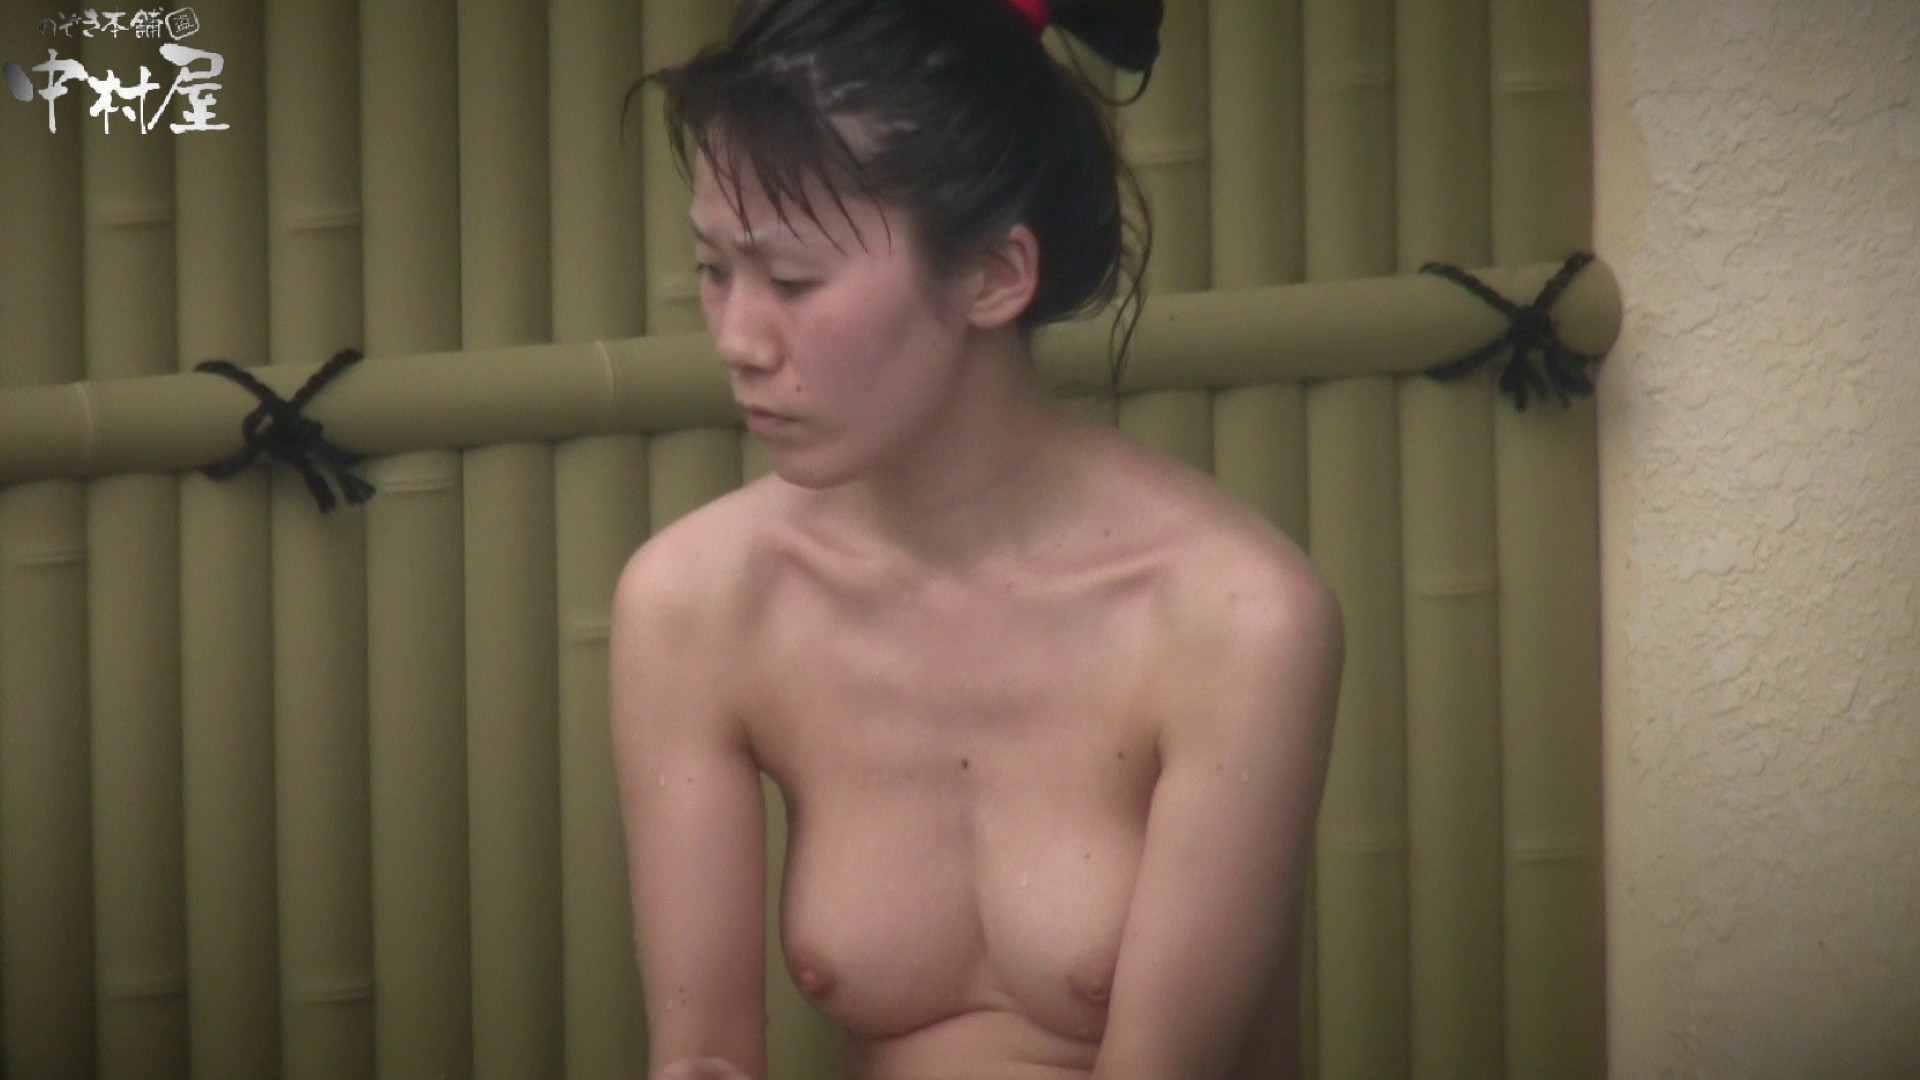 Aquaな露天風呂Vol.896 盗撮映像  81Pix 48